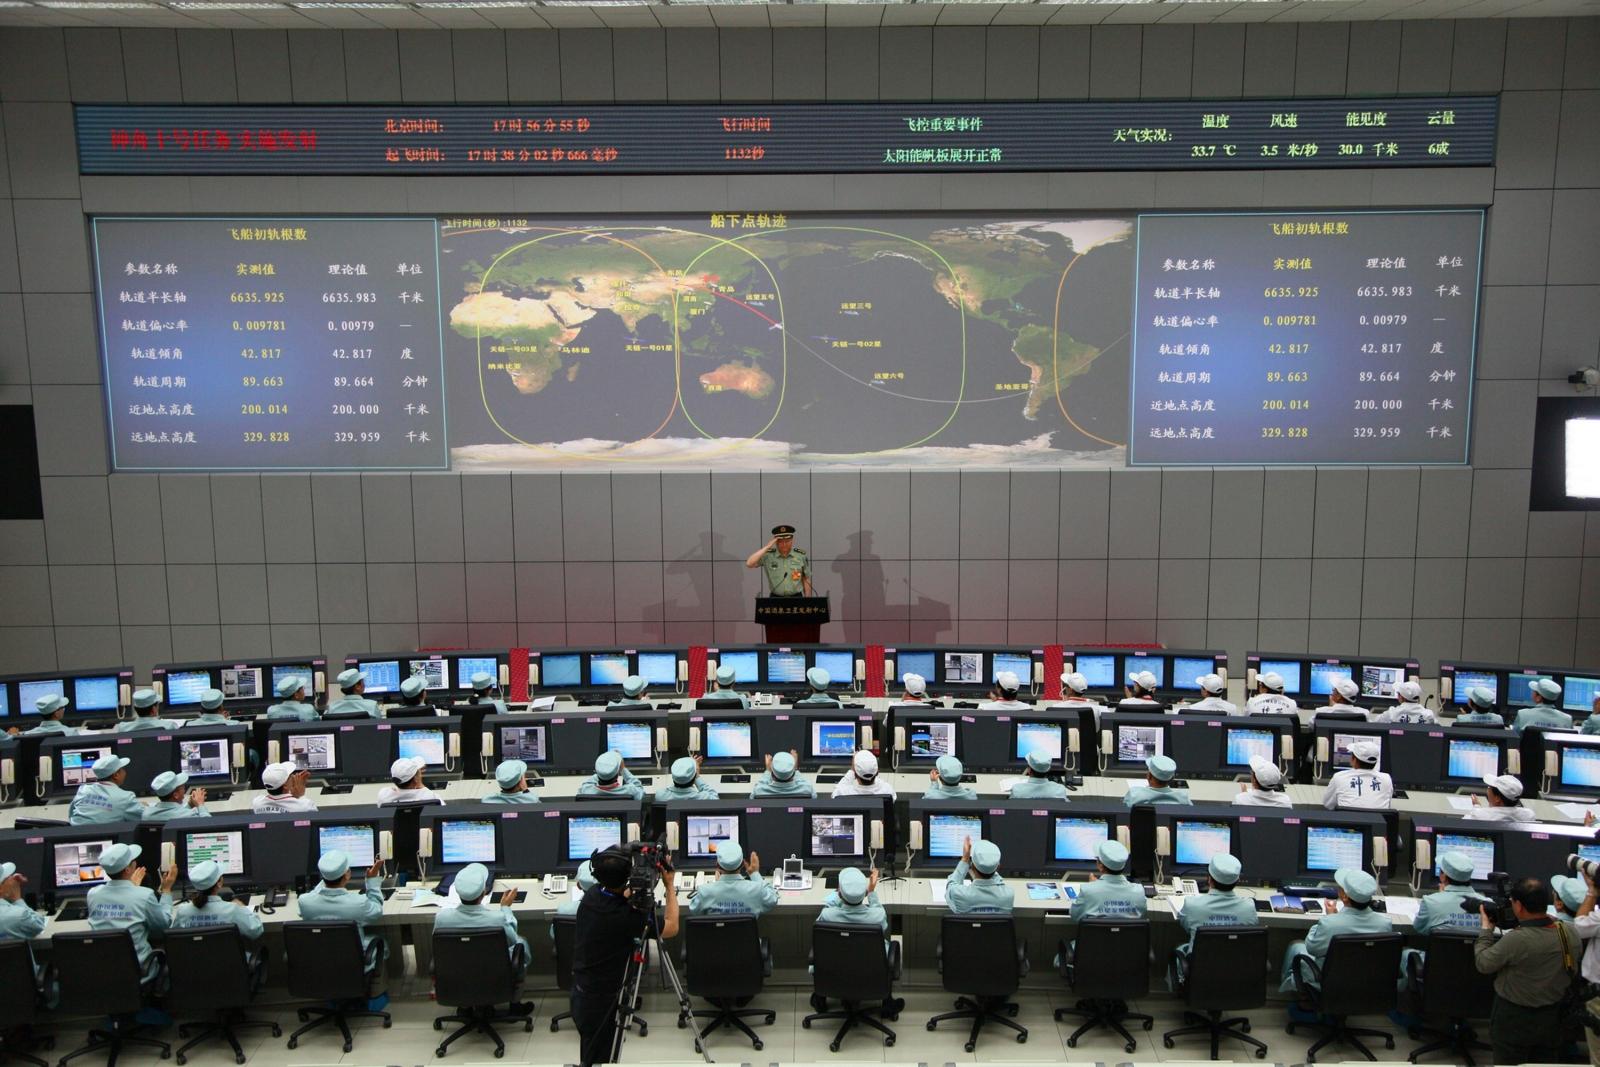 China Space Agency rocket